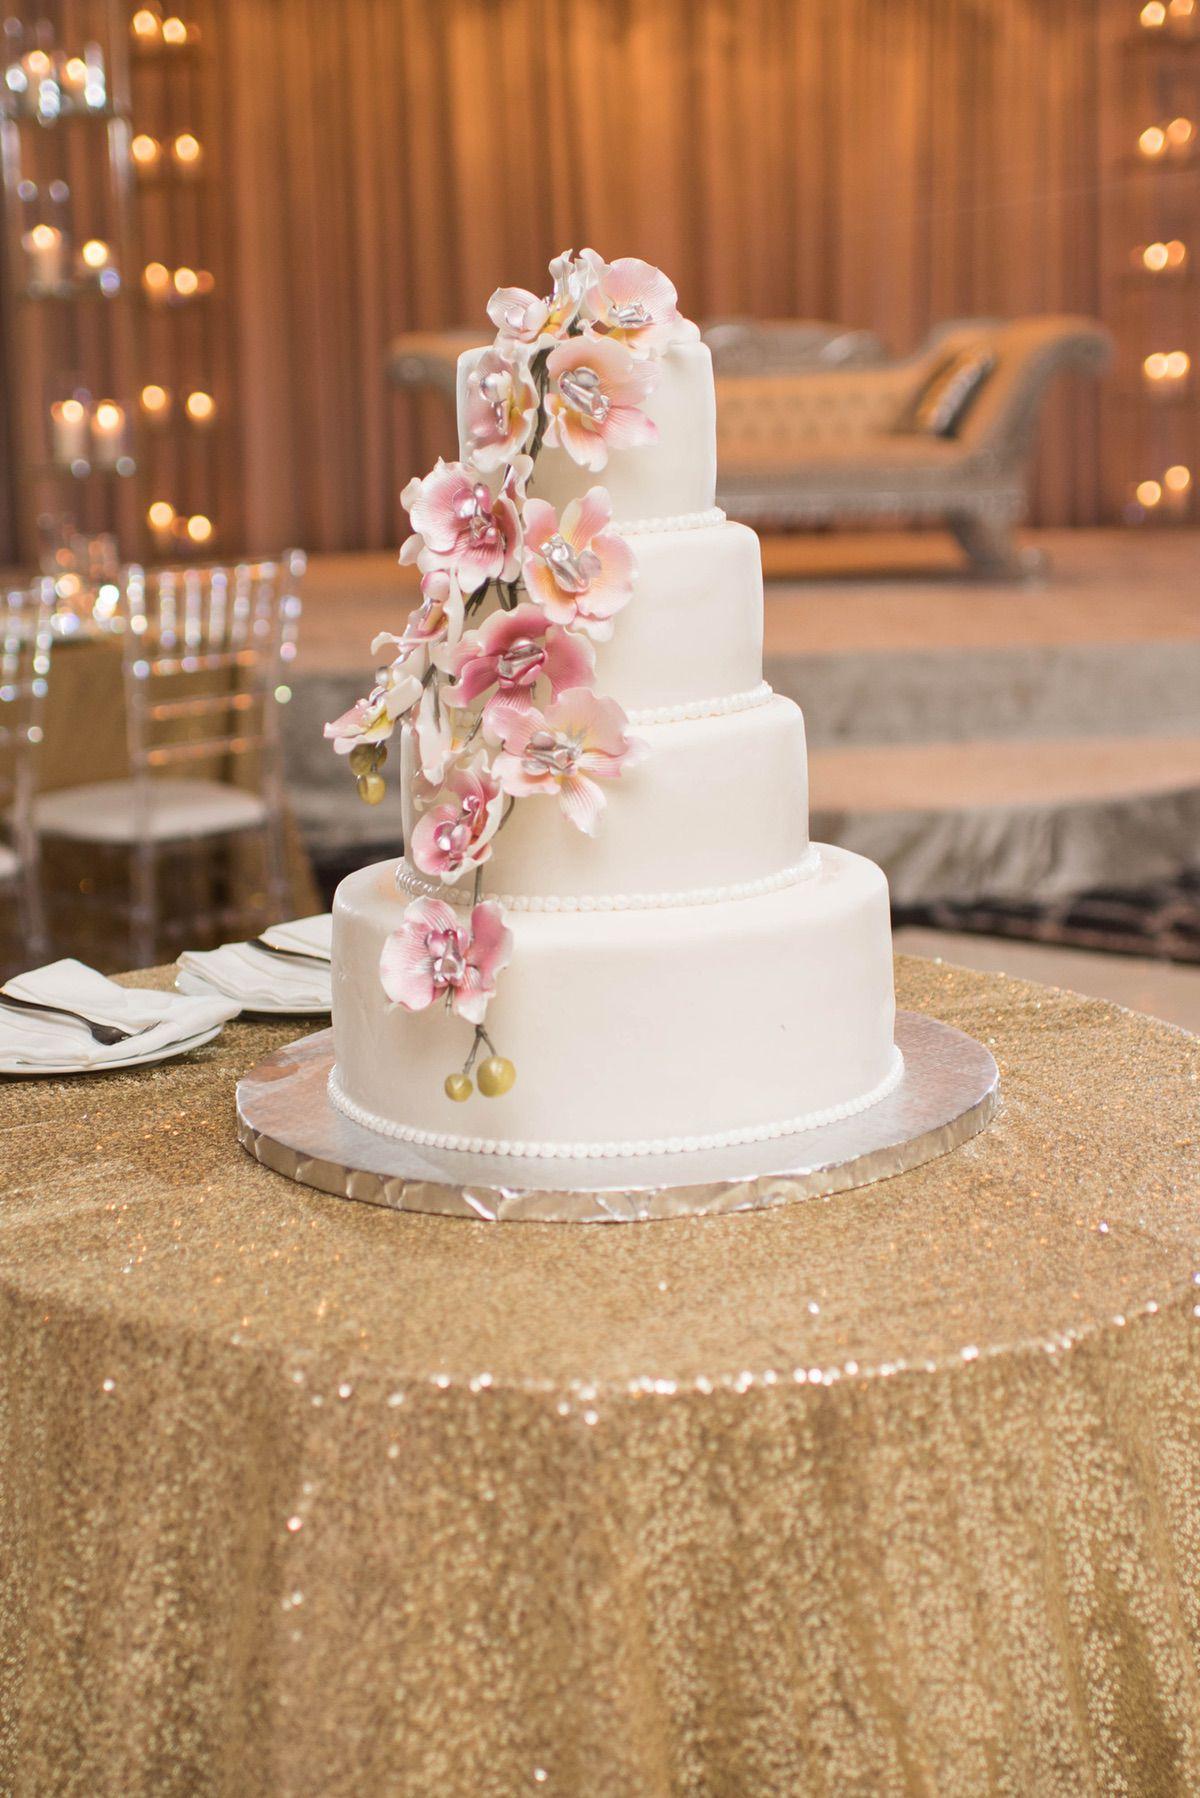 Le_Cape_Weddings_-_Serena_-_Chicago_South_Asian_Wedding-117.jpg